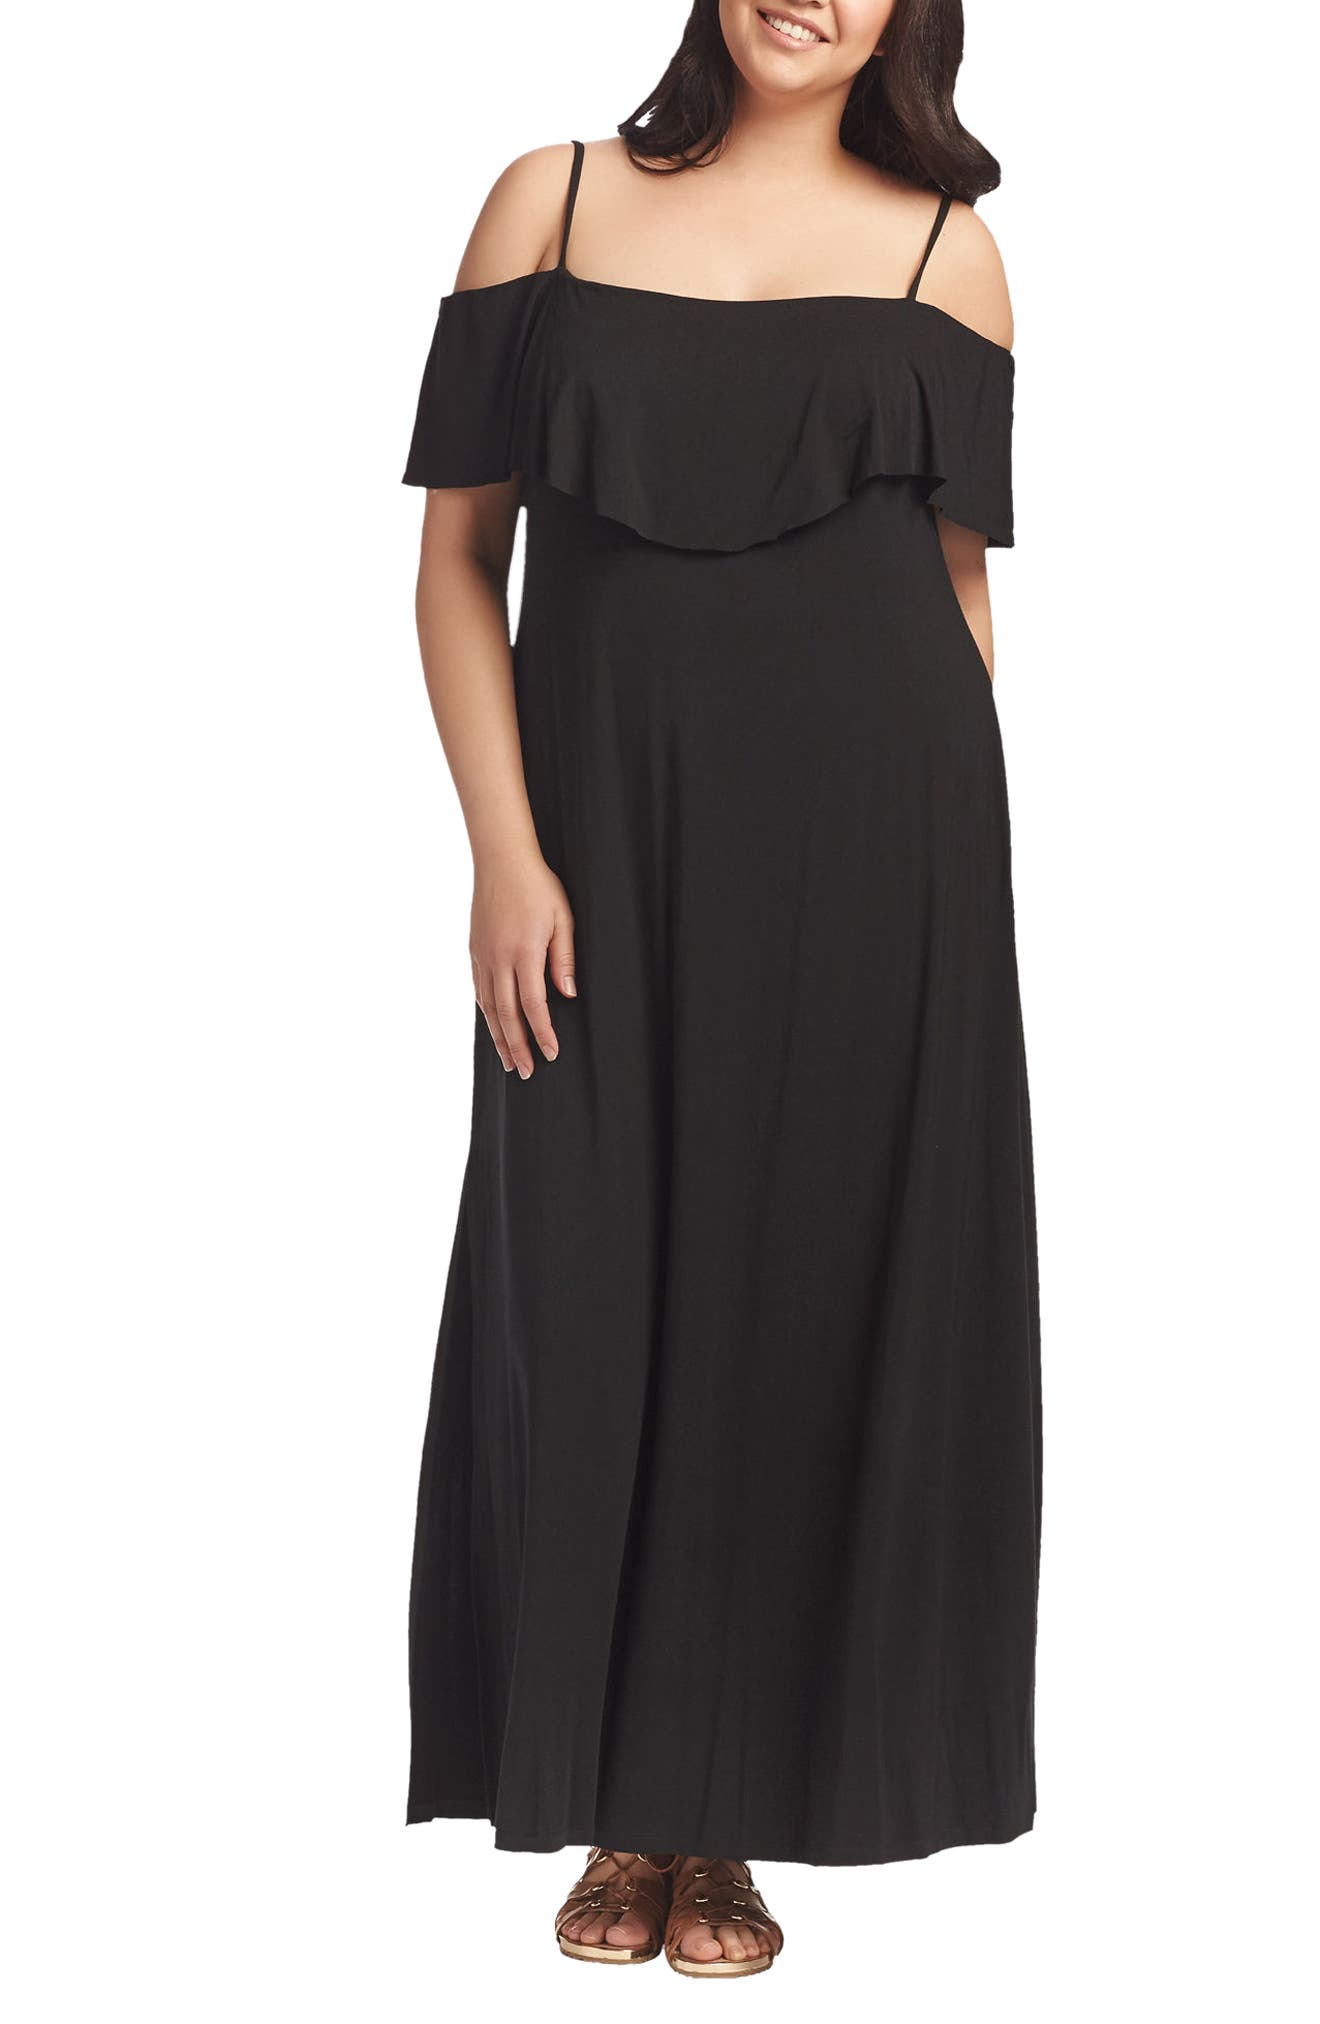 Alternate Image 1 Selected - Tart Tacita Off the Shoulder Maxi Dress (Plus Size)